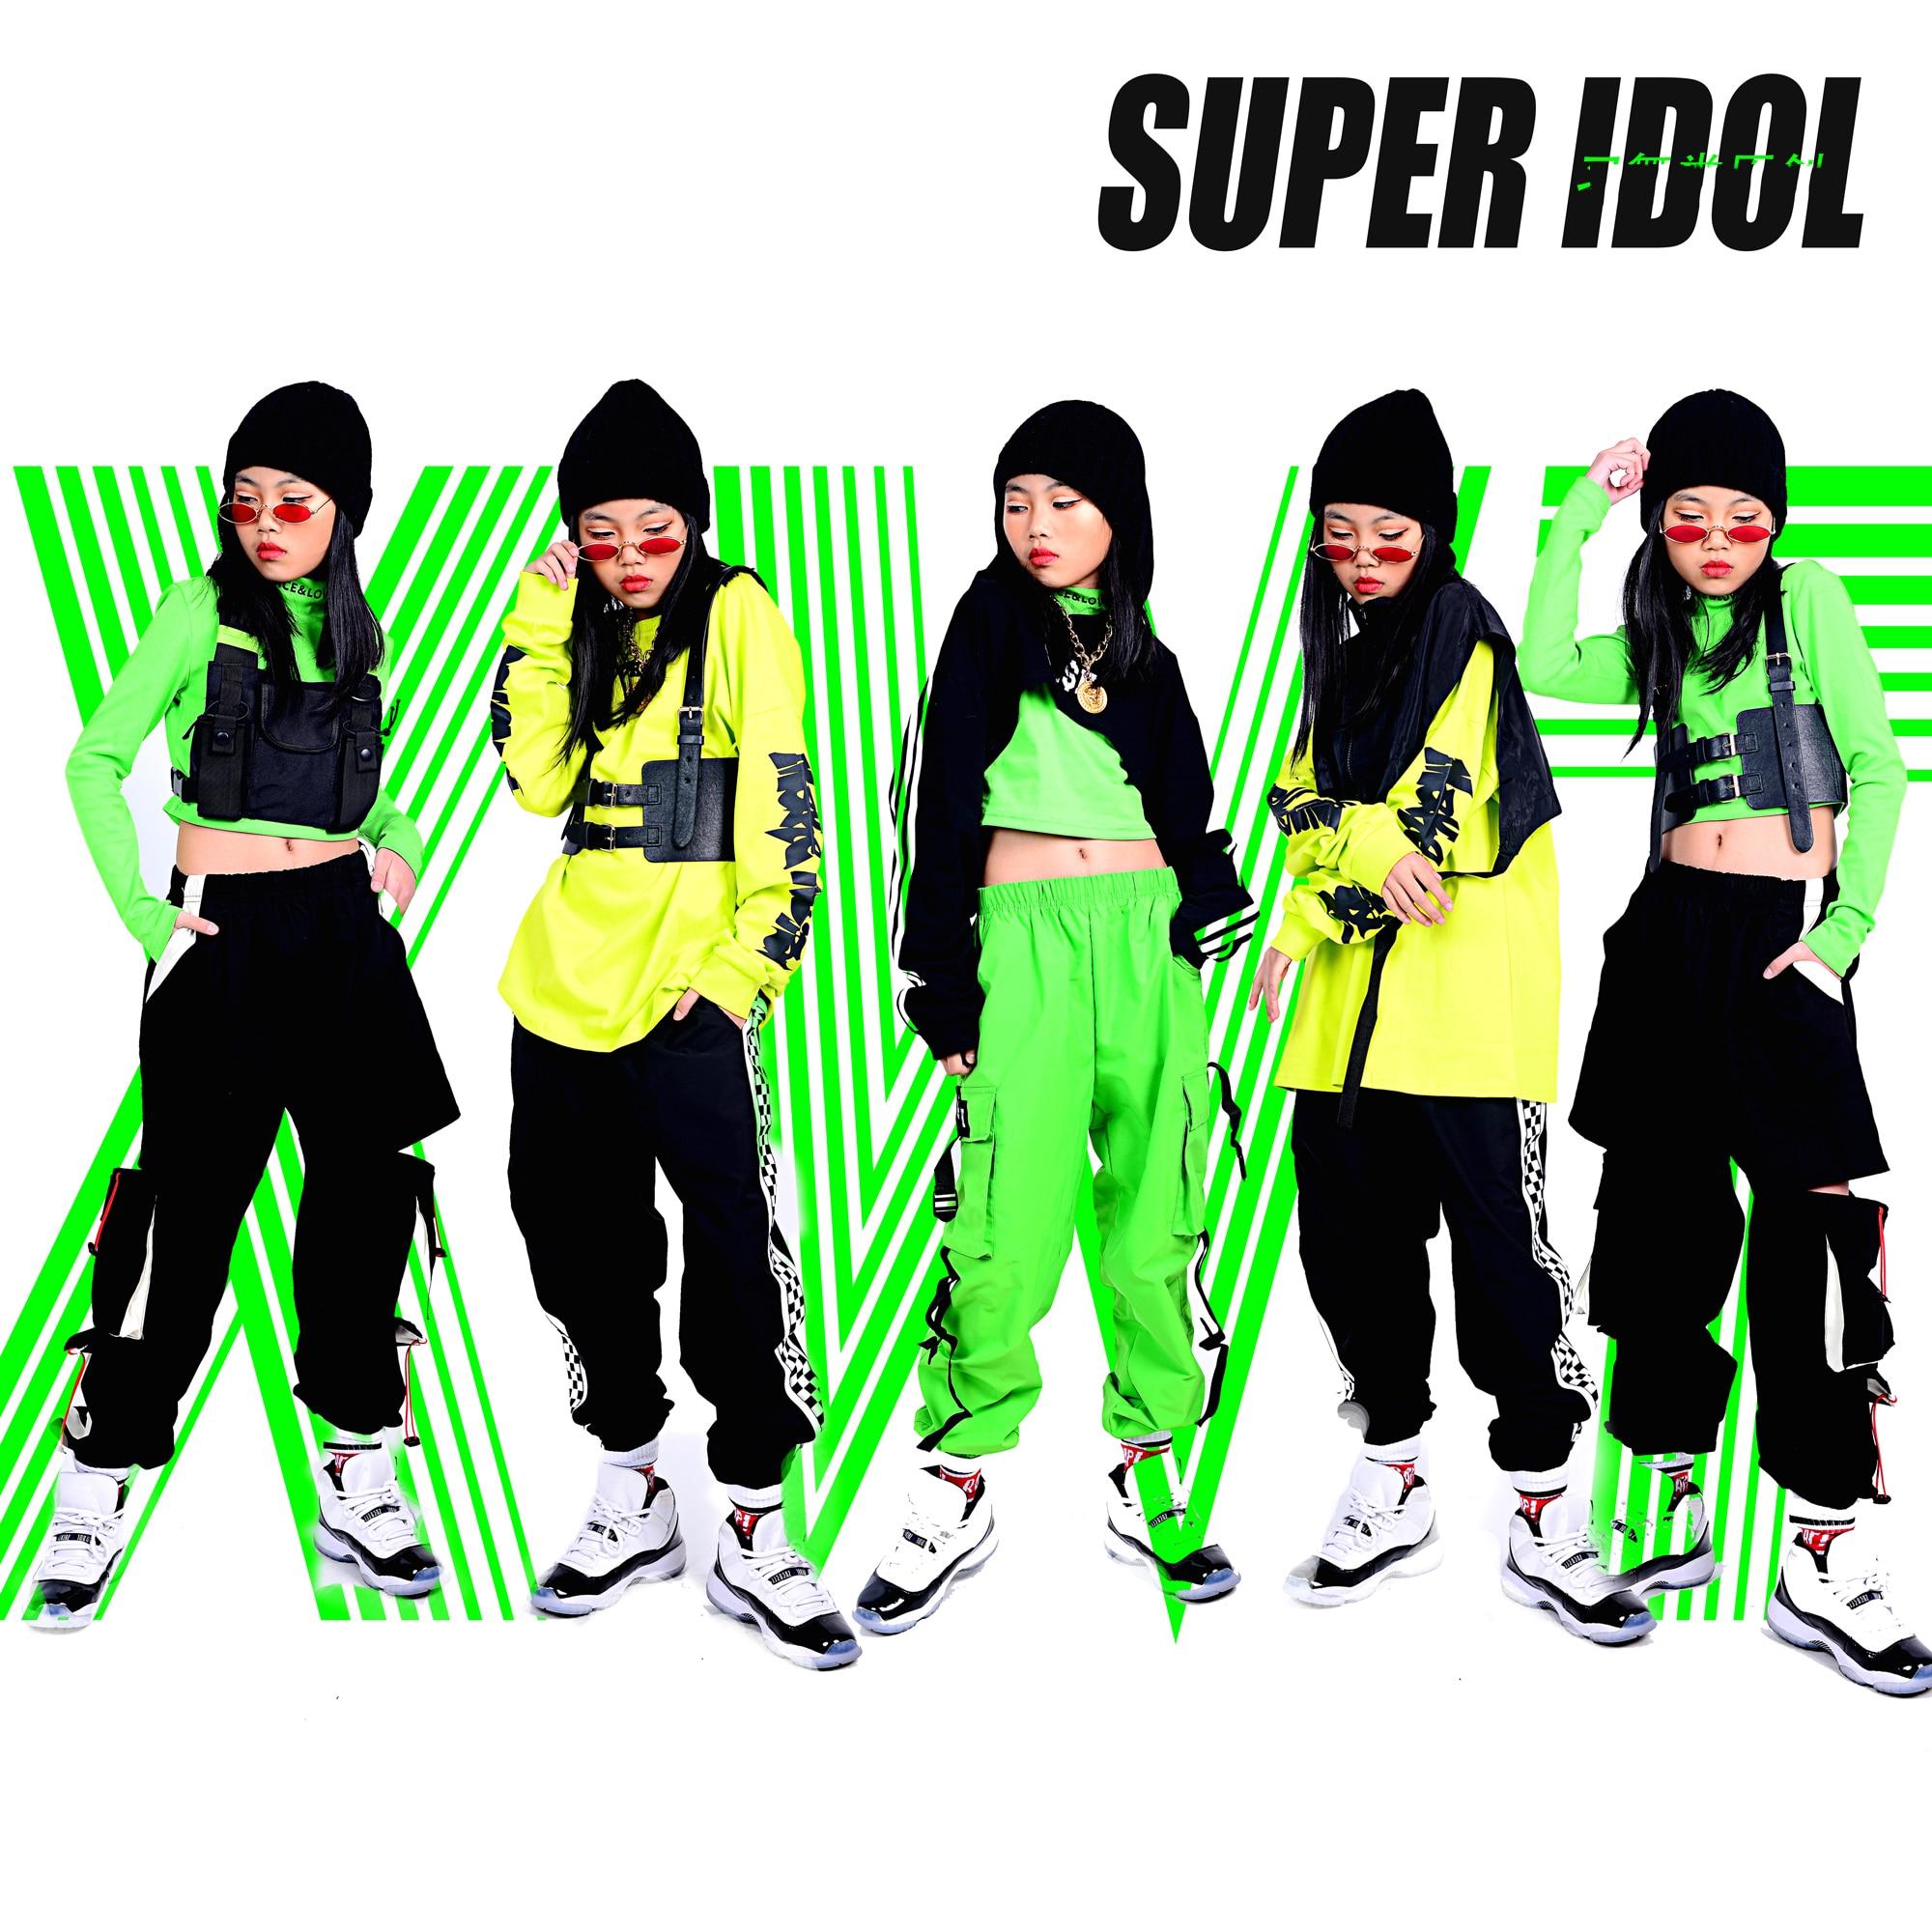 Black Fluorescent Series Children'S Hip-Hop Dance Costumes For Kids Performance Clothing Boys Girls Jazz Dance Clothes DQS3713